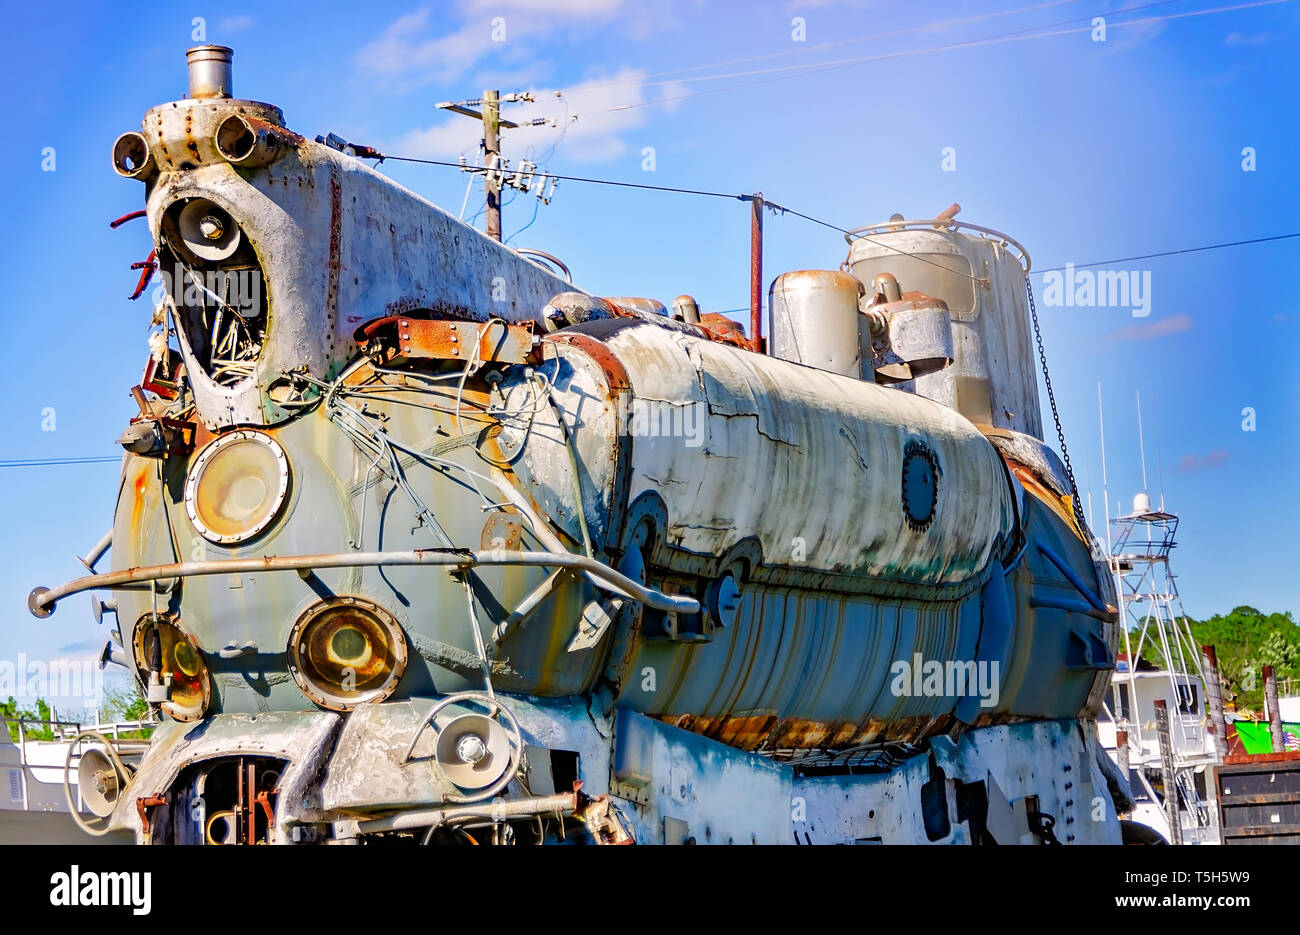 A Cold War-era Russian submarine rusts away in Steiner Shipyard, February 8, 2017, in Bayou La Batre, Alabama. - Stock Image